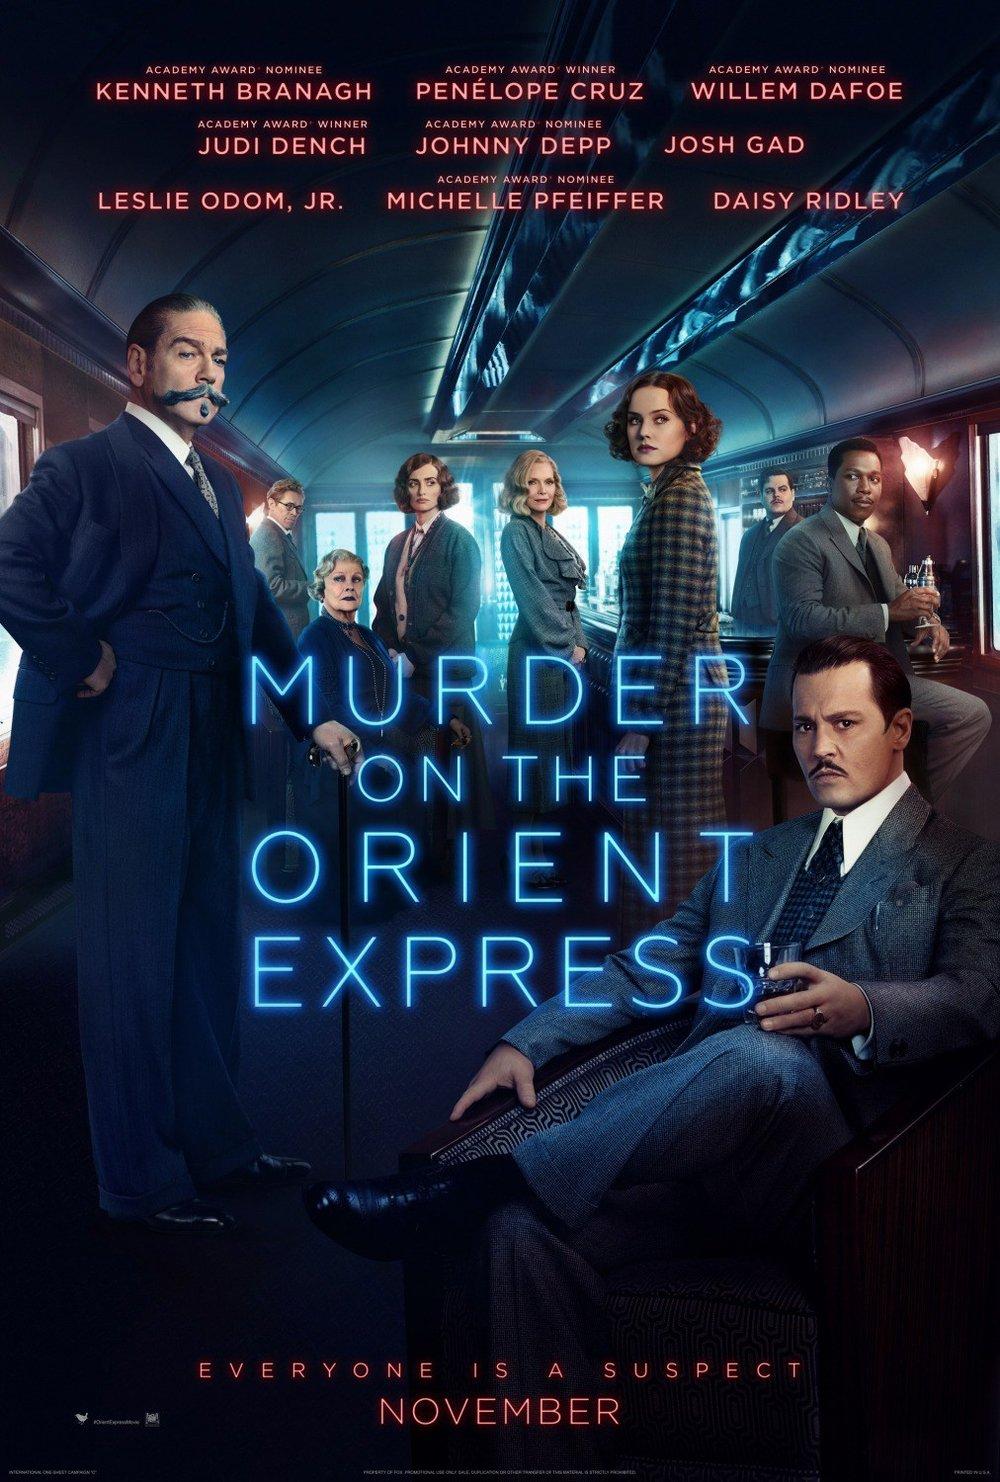 Murder-on-the-Orient-Express-New-Film-Poster.jpg